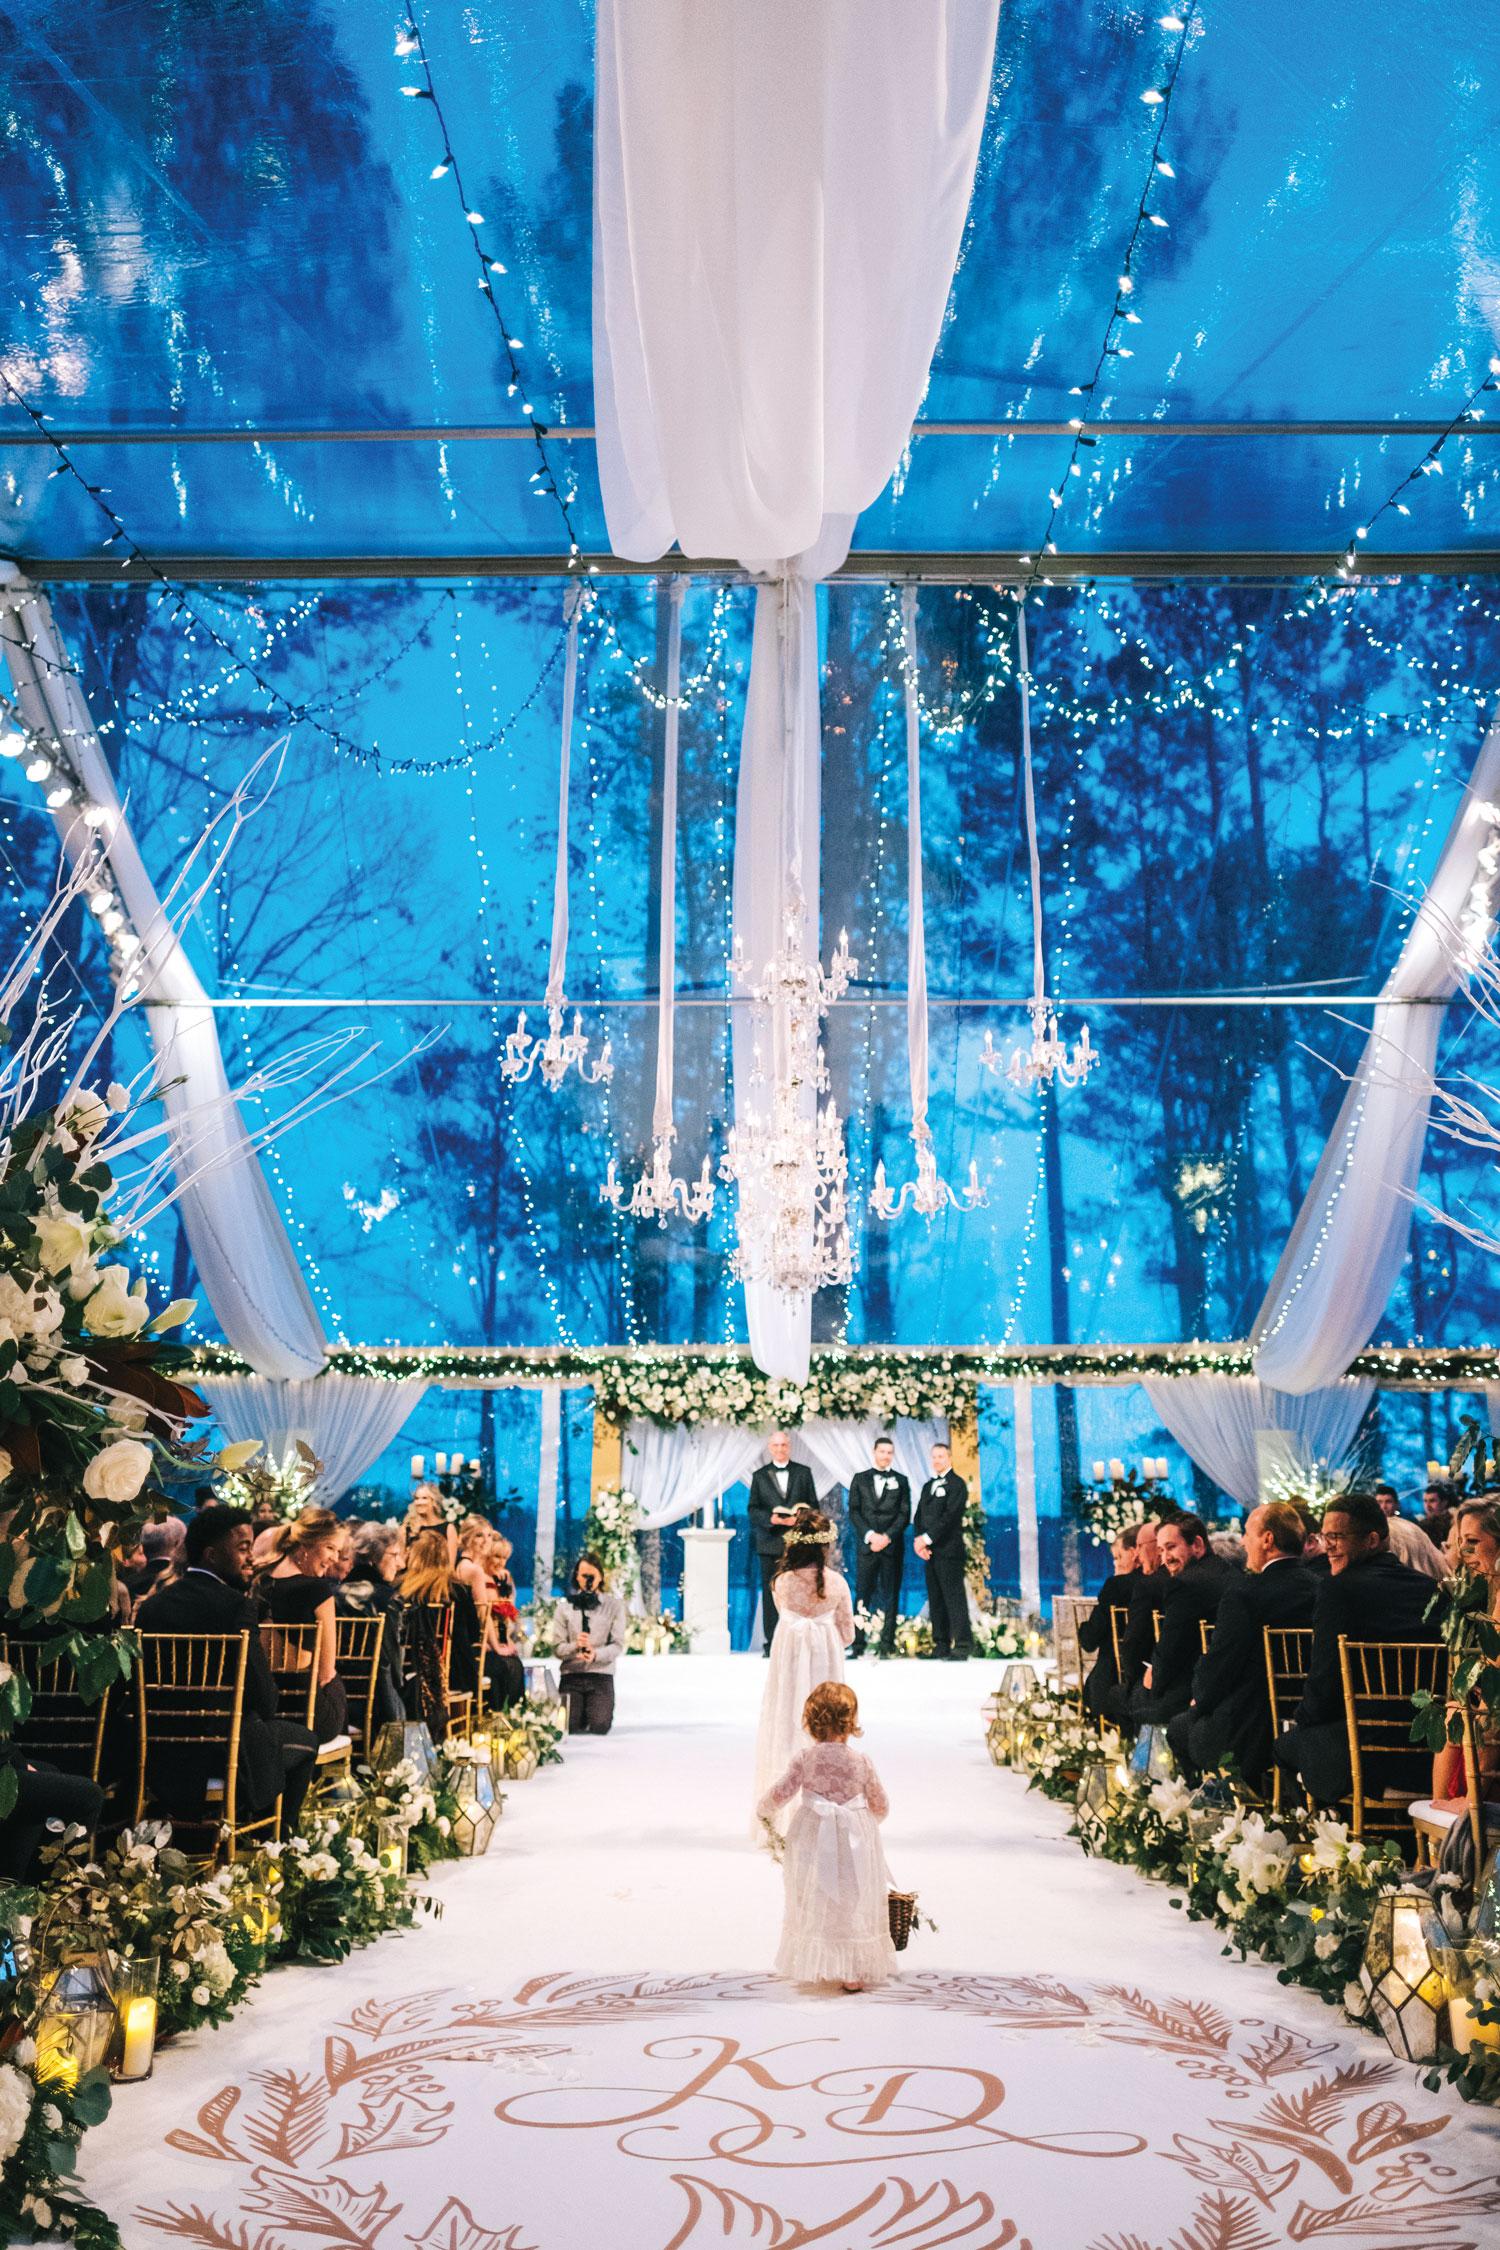 Original Runner Company aisle winter wedding christmas decor suzanne reinhard events Inside Weddings fall 2018 issue